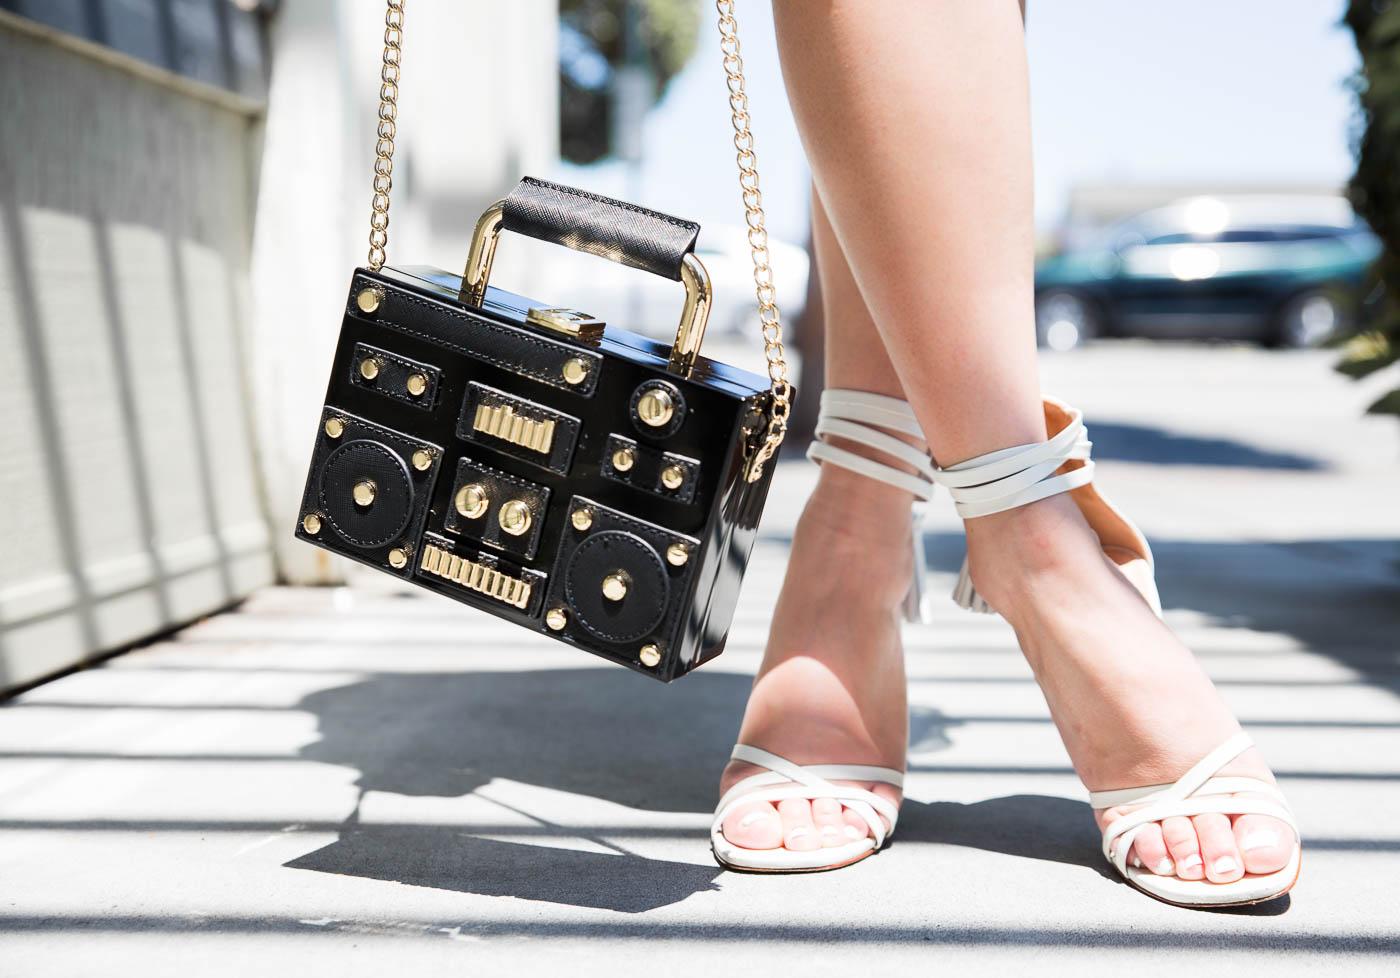 Zara Stereo Clutch Bag & Schutz Sandals | The Chic Diary